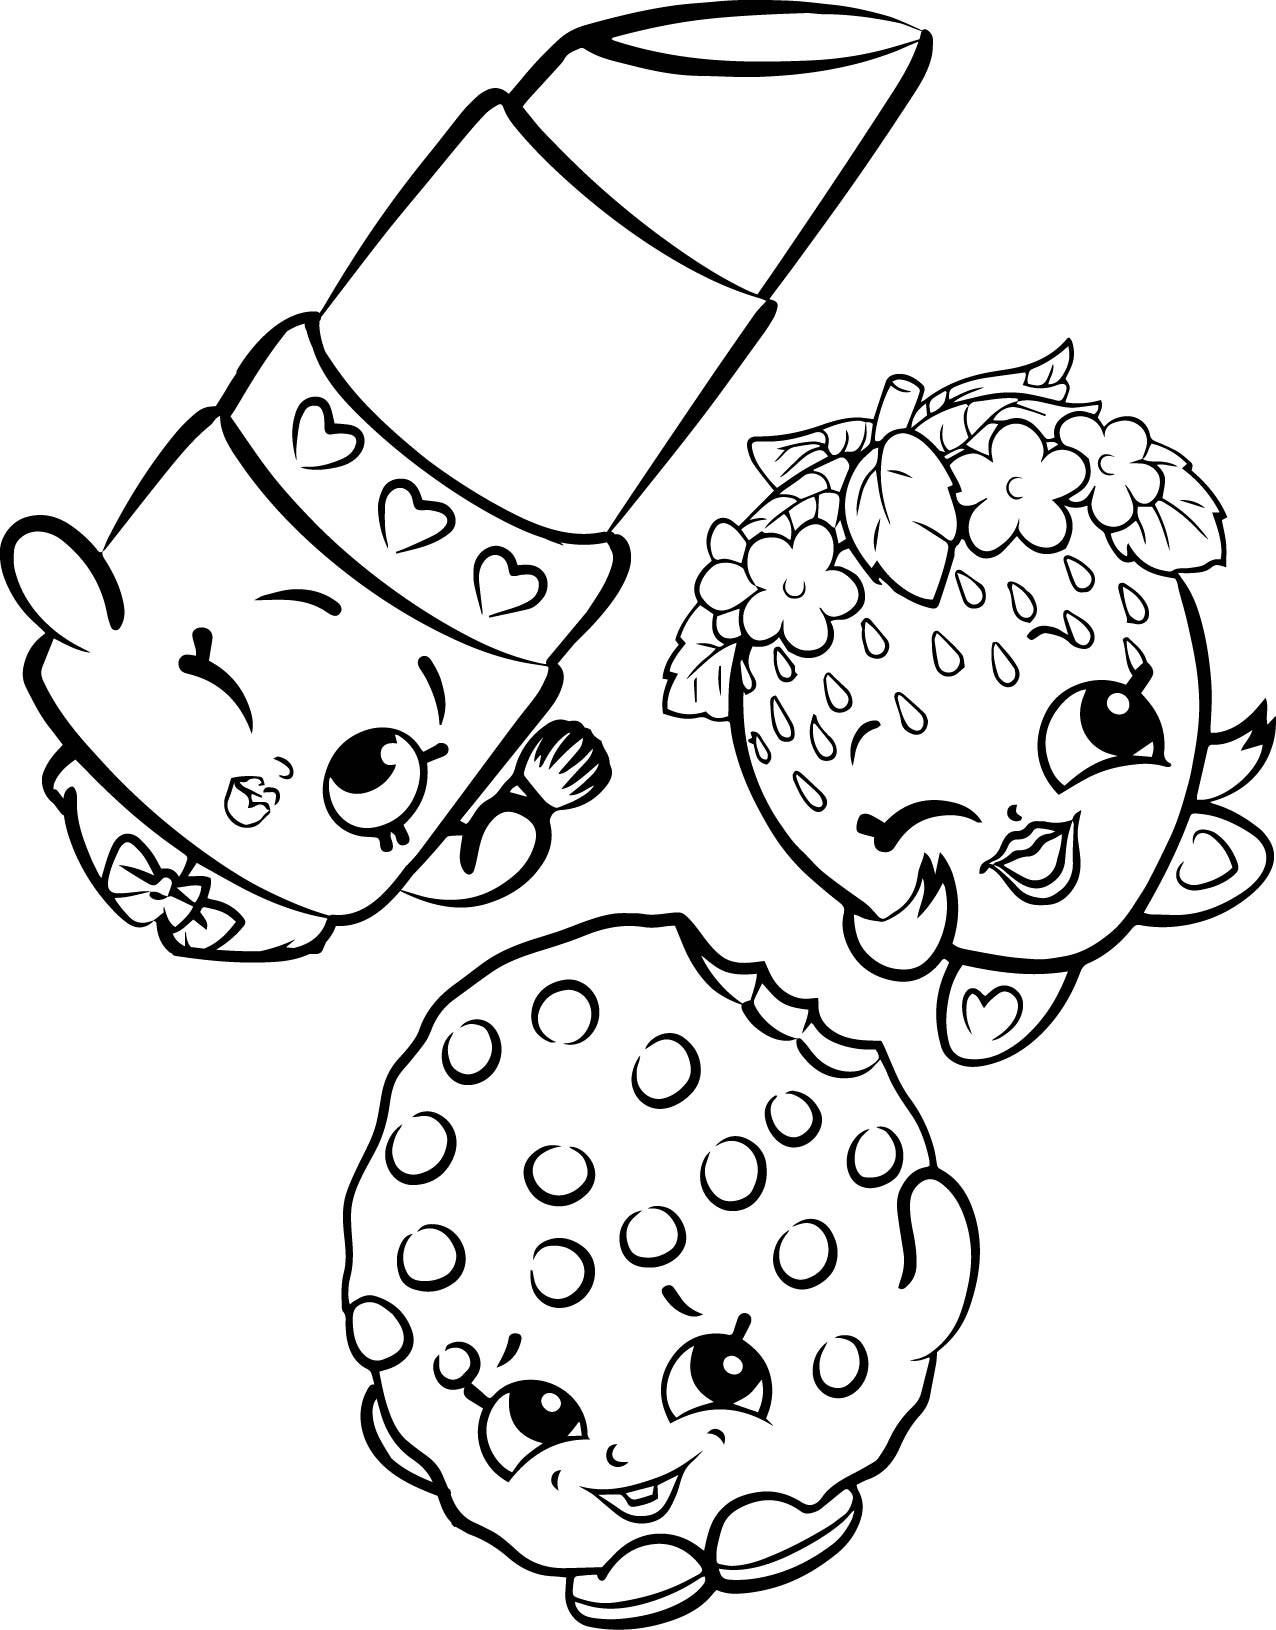 Coloring Sheets For Girls Shopkins  Shopkins Coloring Pages Best Coloring Pages For Kids